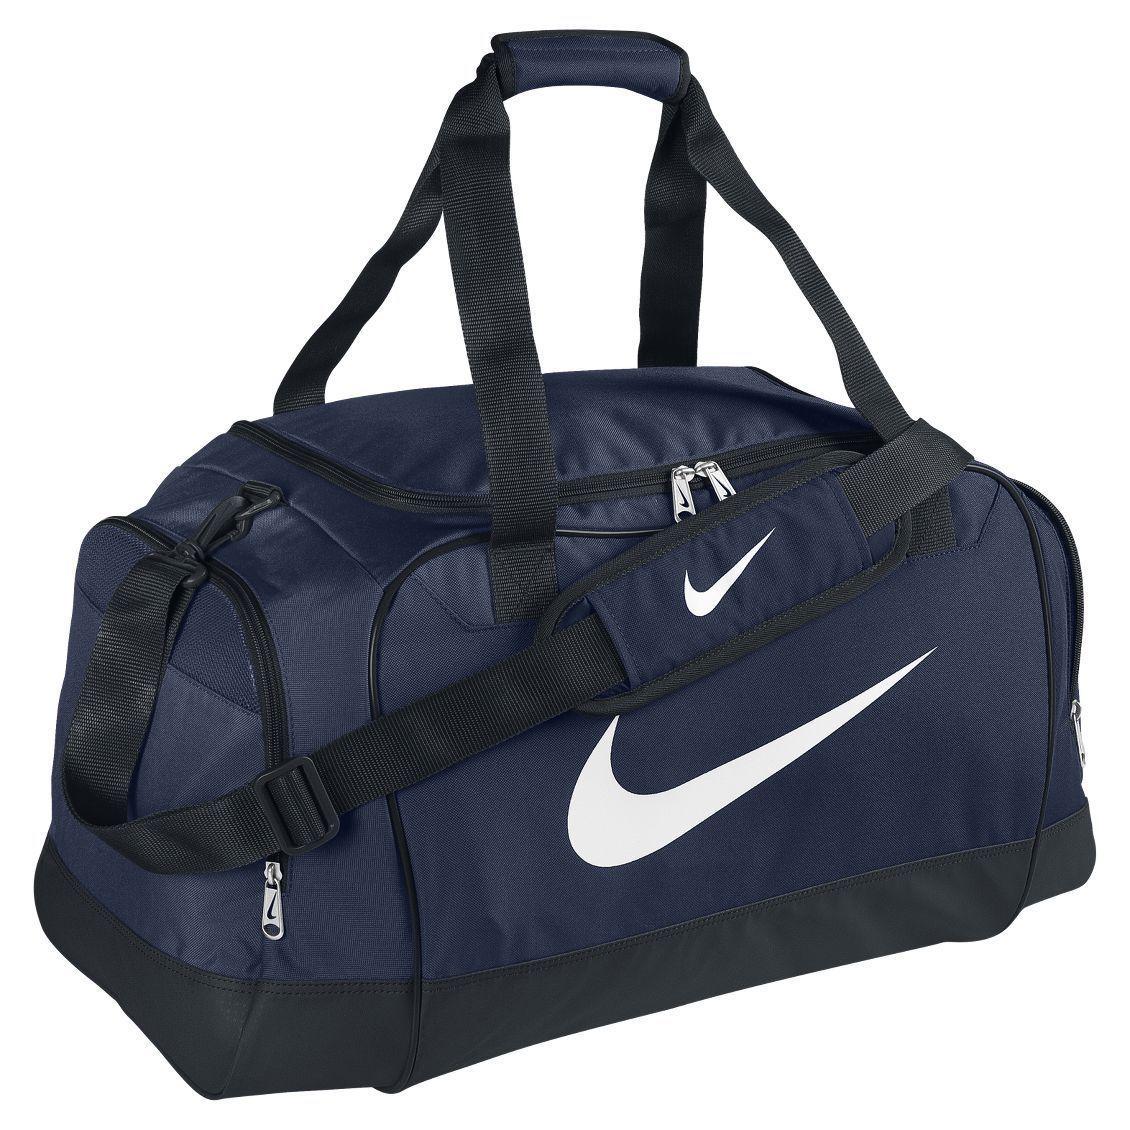 A Gym Bag That My Target Audience Would Carry Nike Duffle Bag Gym Bag Badminton Bag